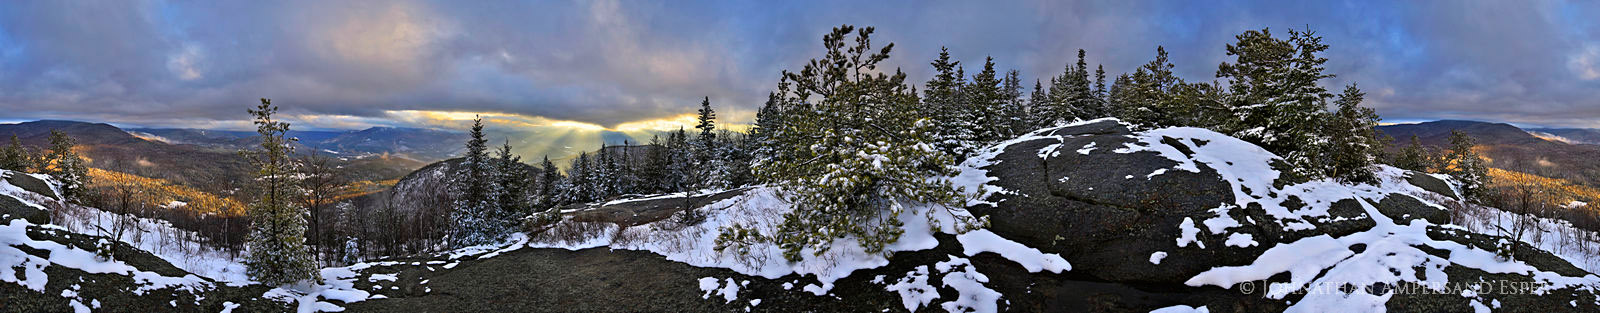 Big Crow Mountain,Big Crow Mt summit, summit,360 degree panorama,panorama,spring,snowfall,spring snowfall, photo